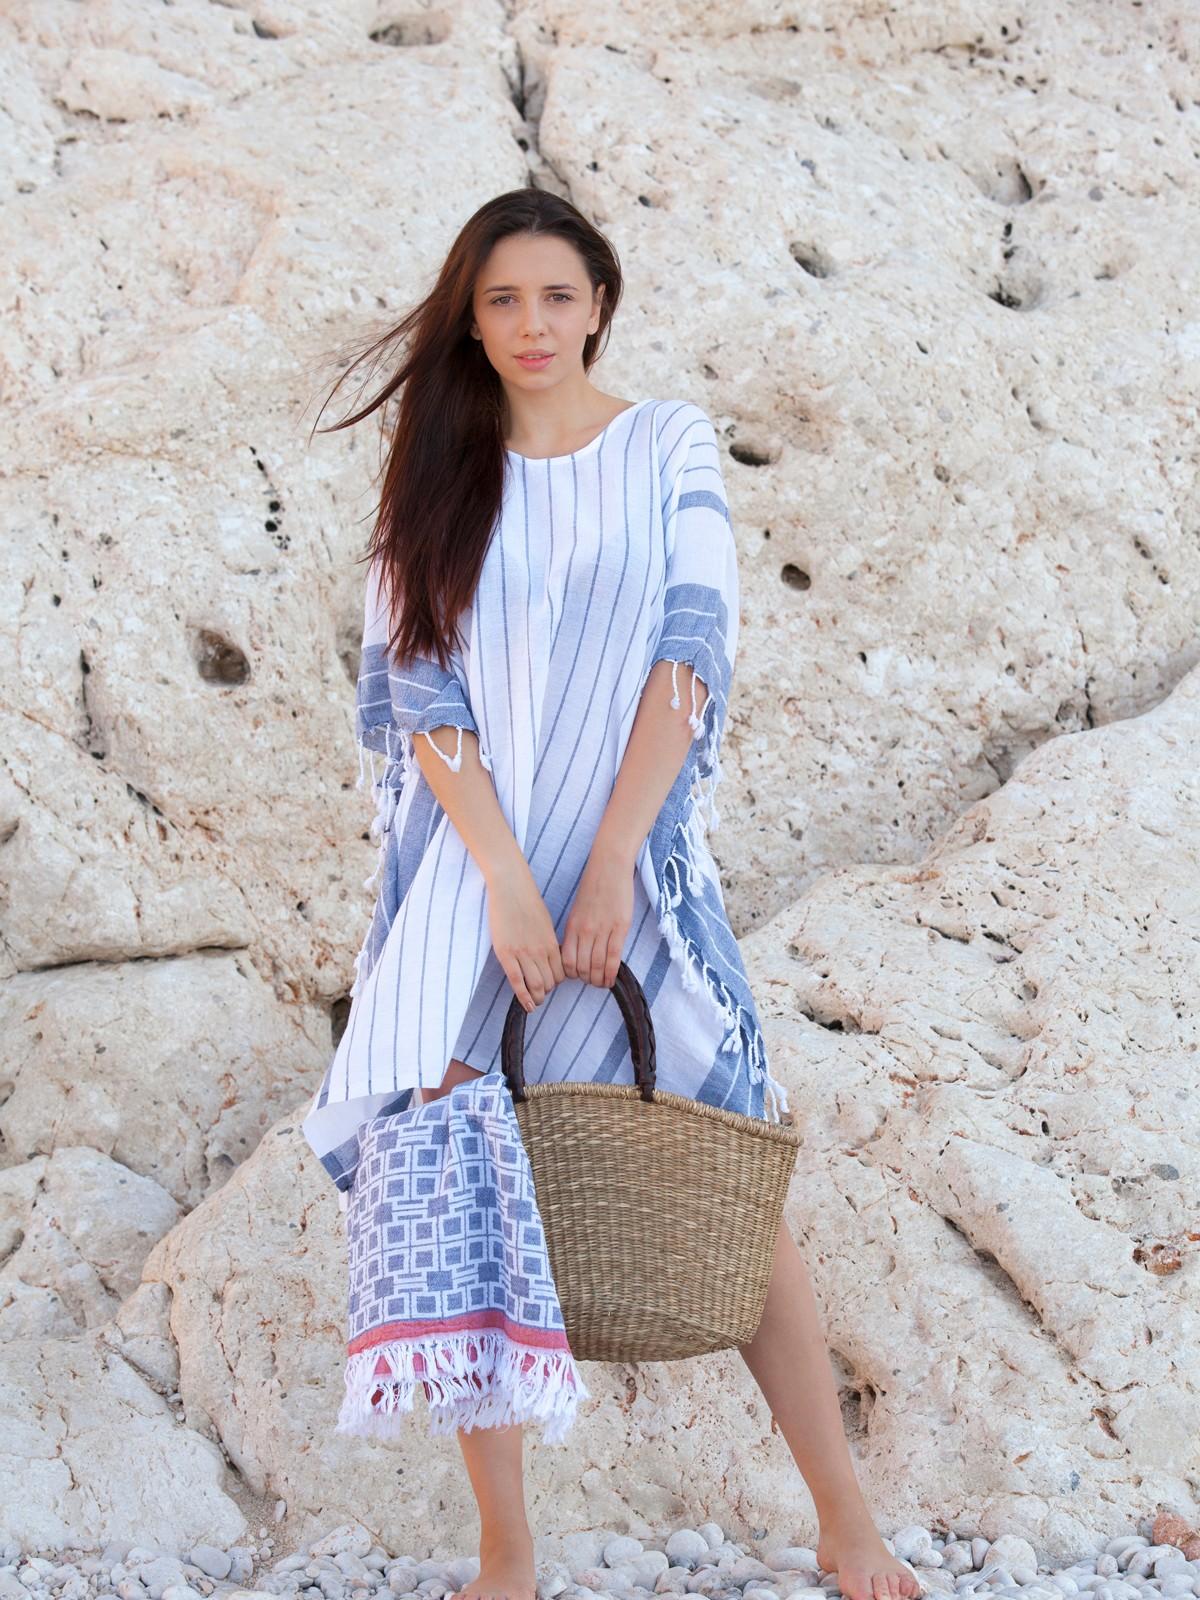 pacific-beach-dress-1200x1600w